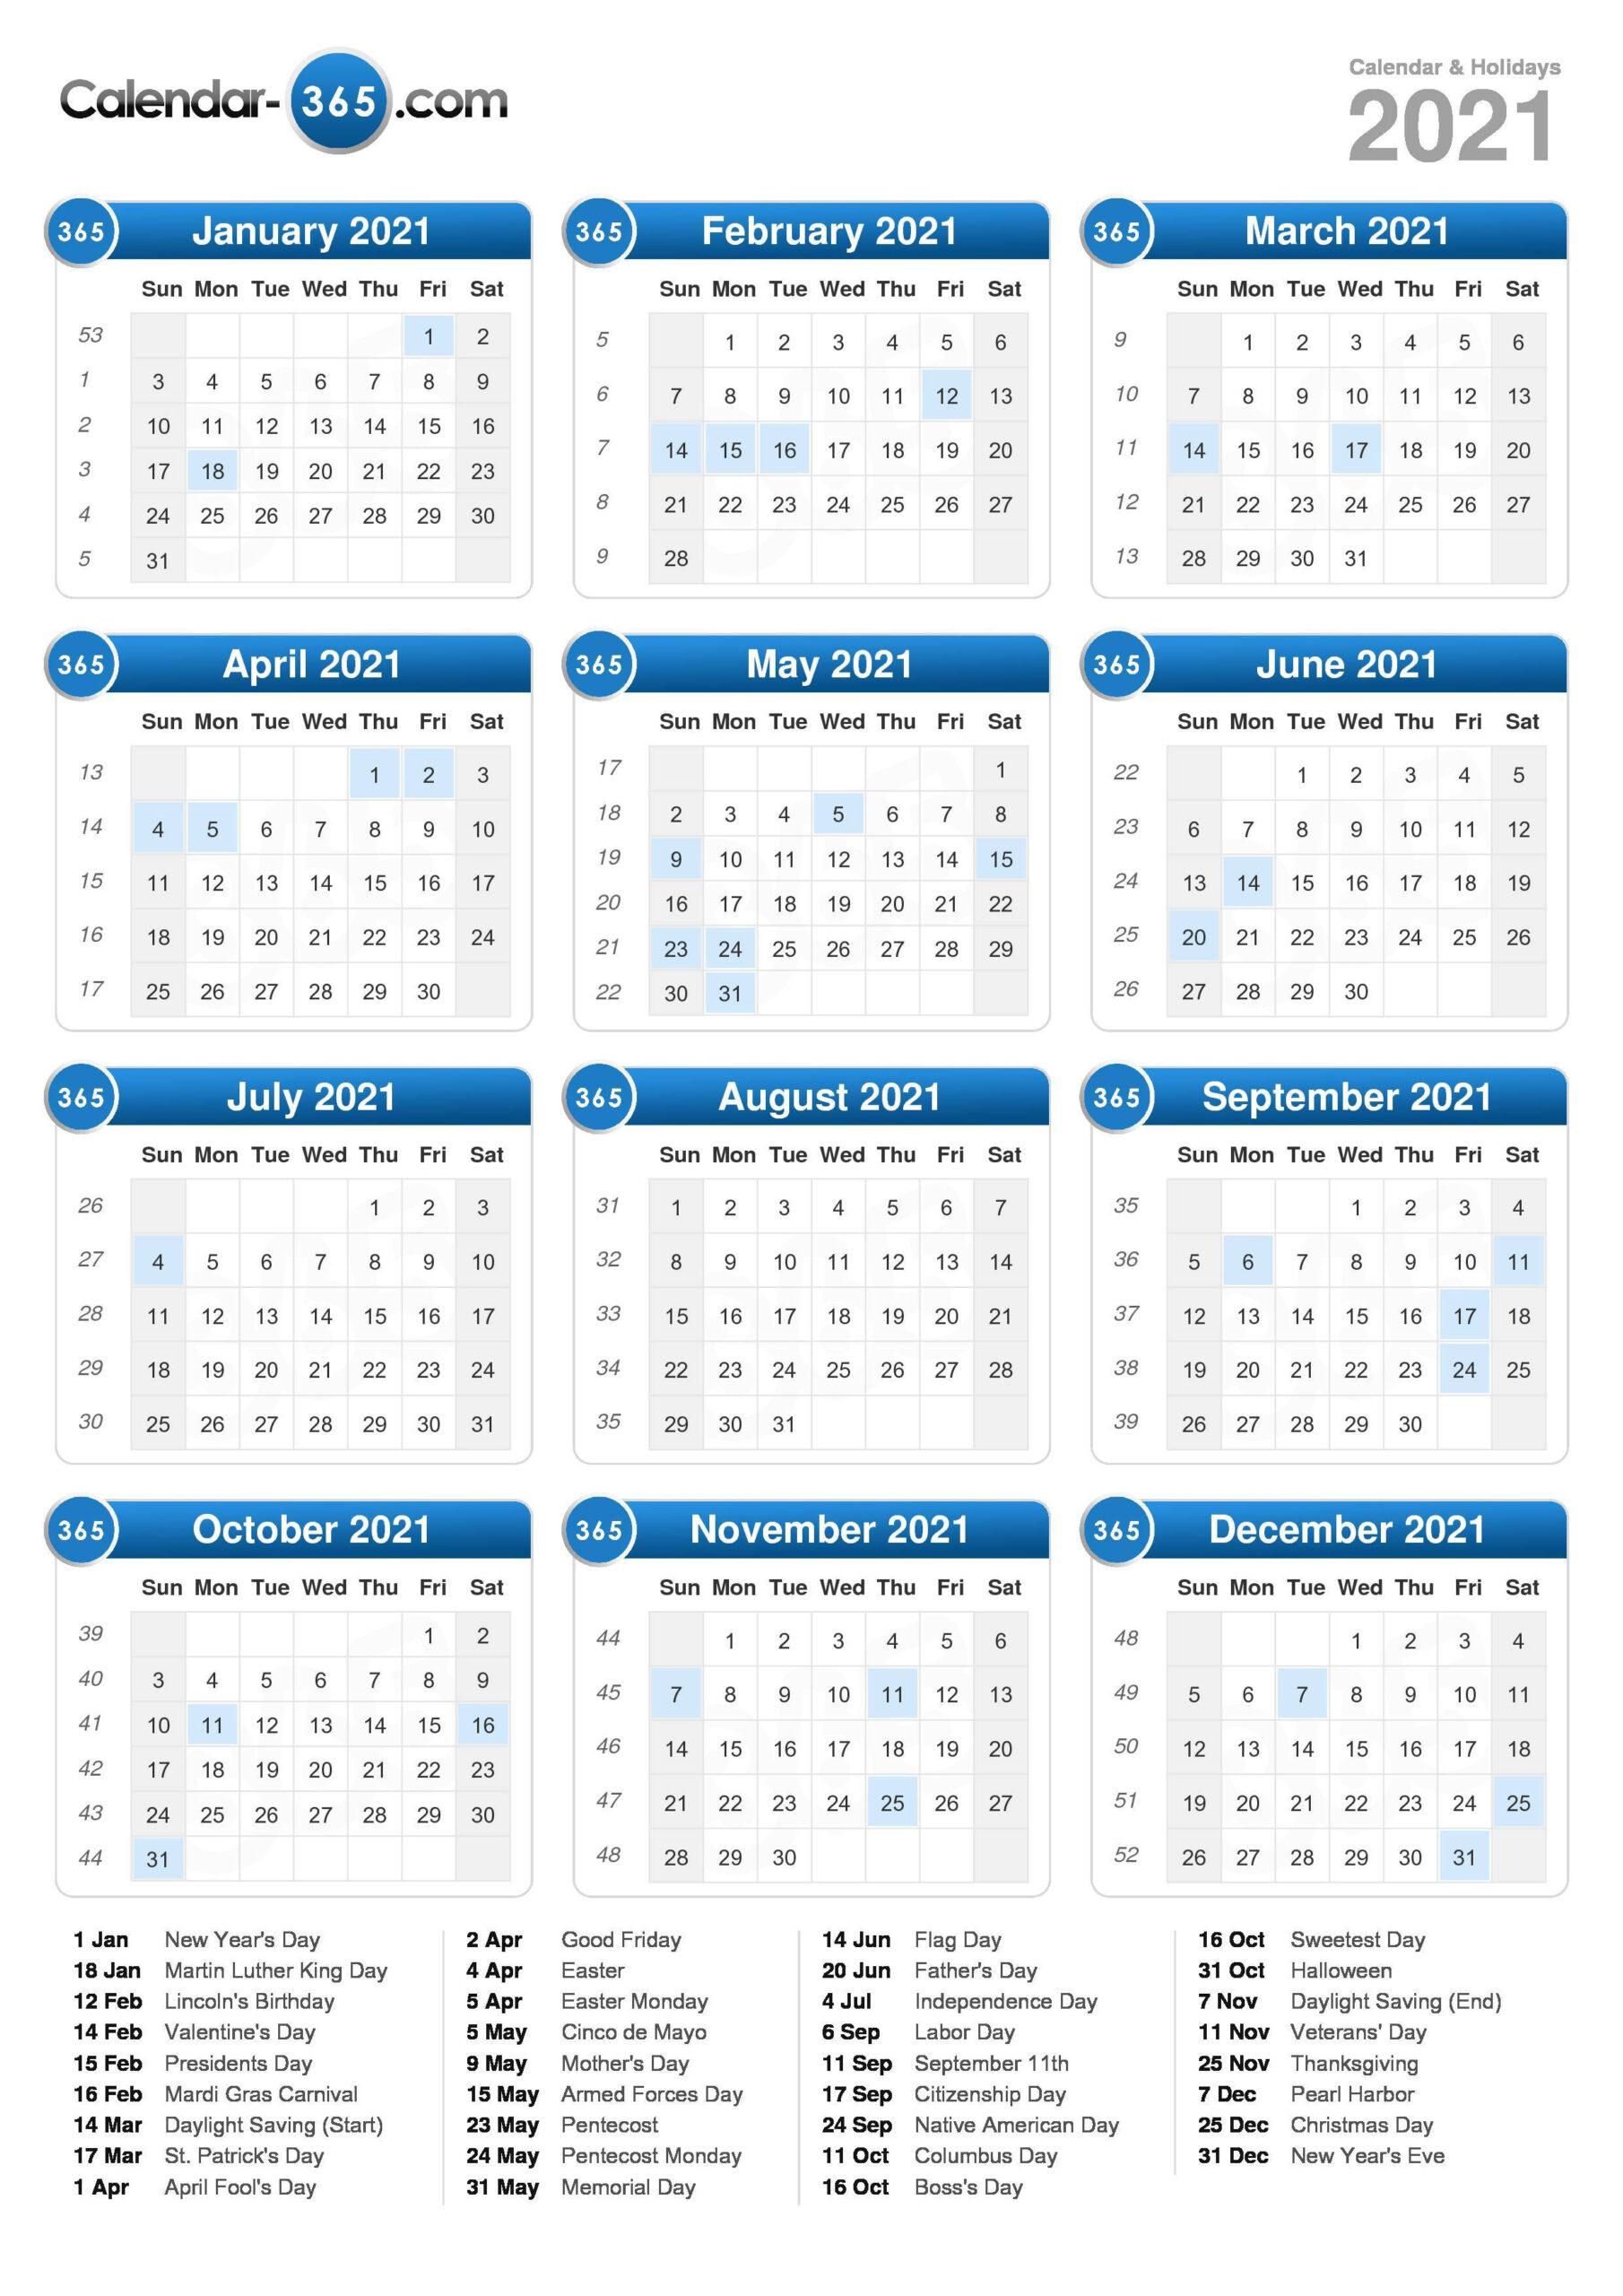 2021 Calendar for Weekly Planner For 2021- 52 Weeks